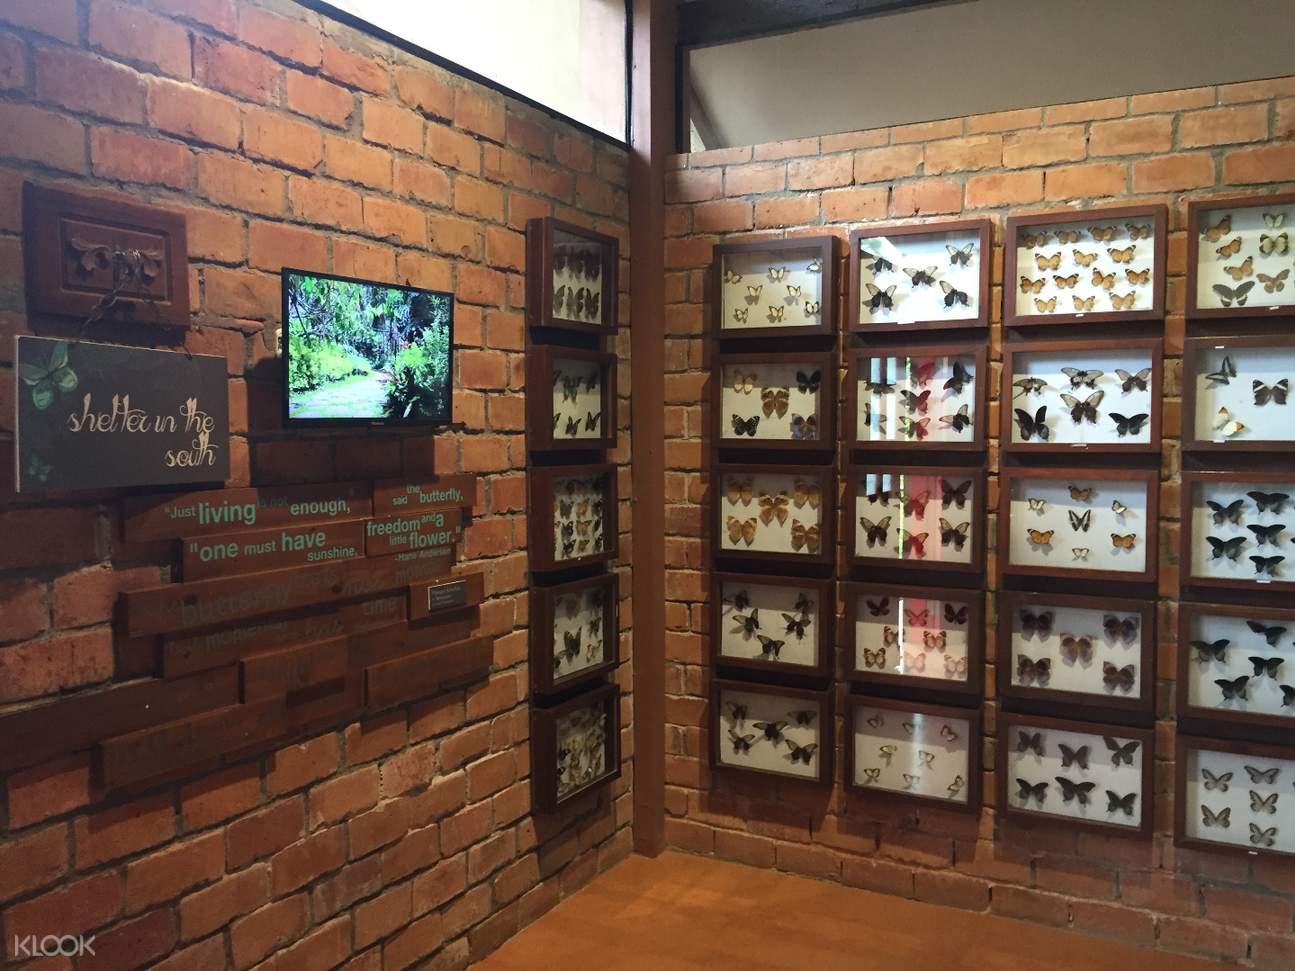 museo de mariposa displays